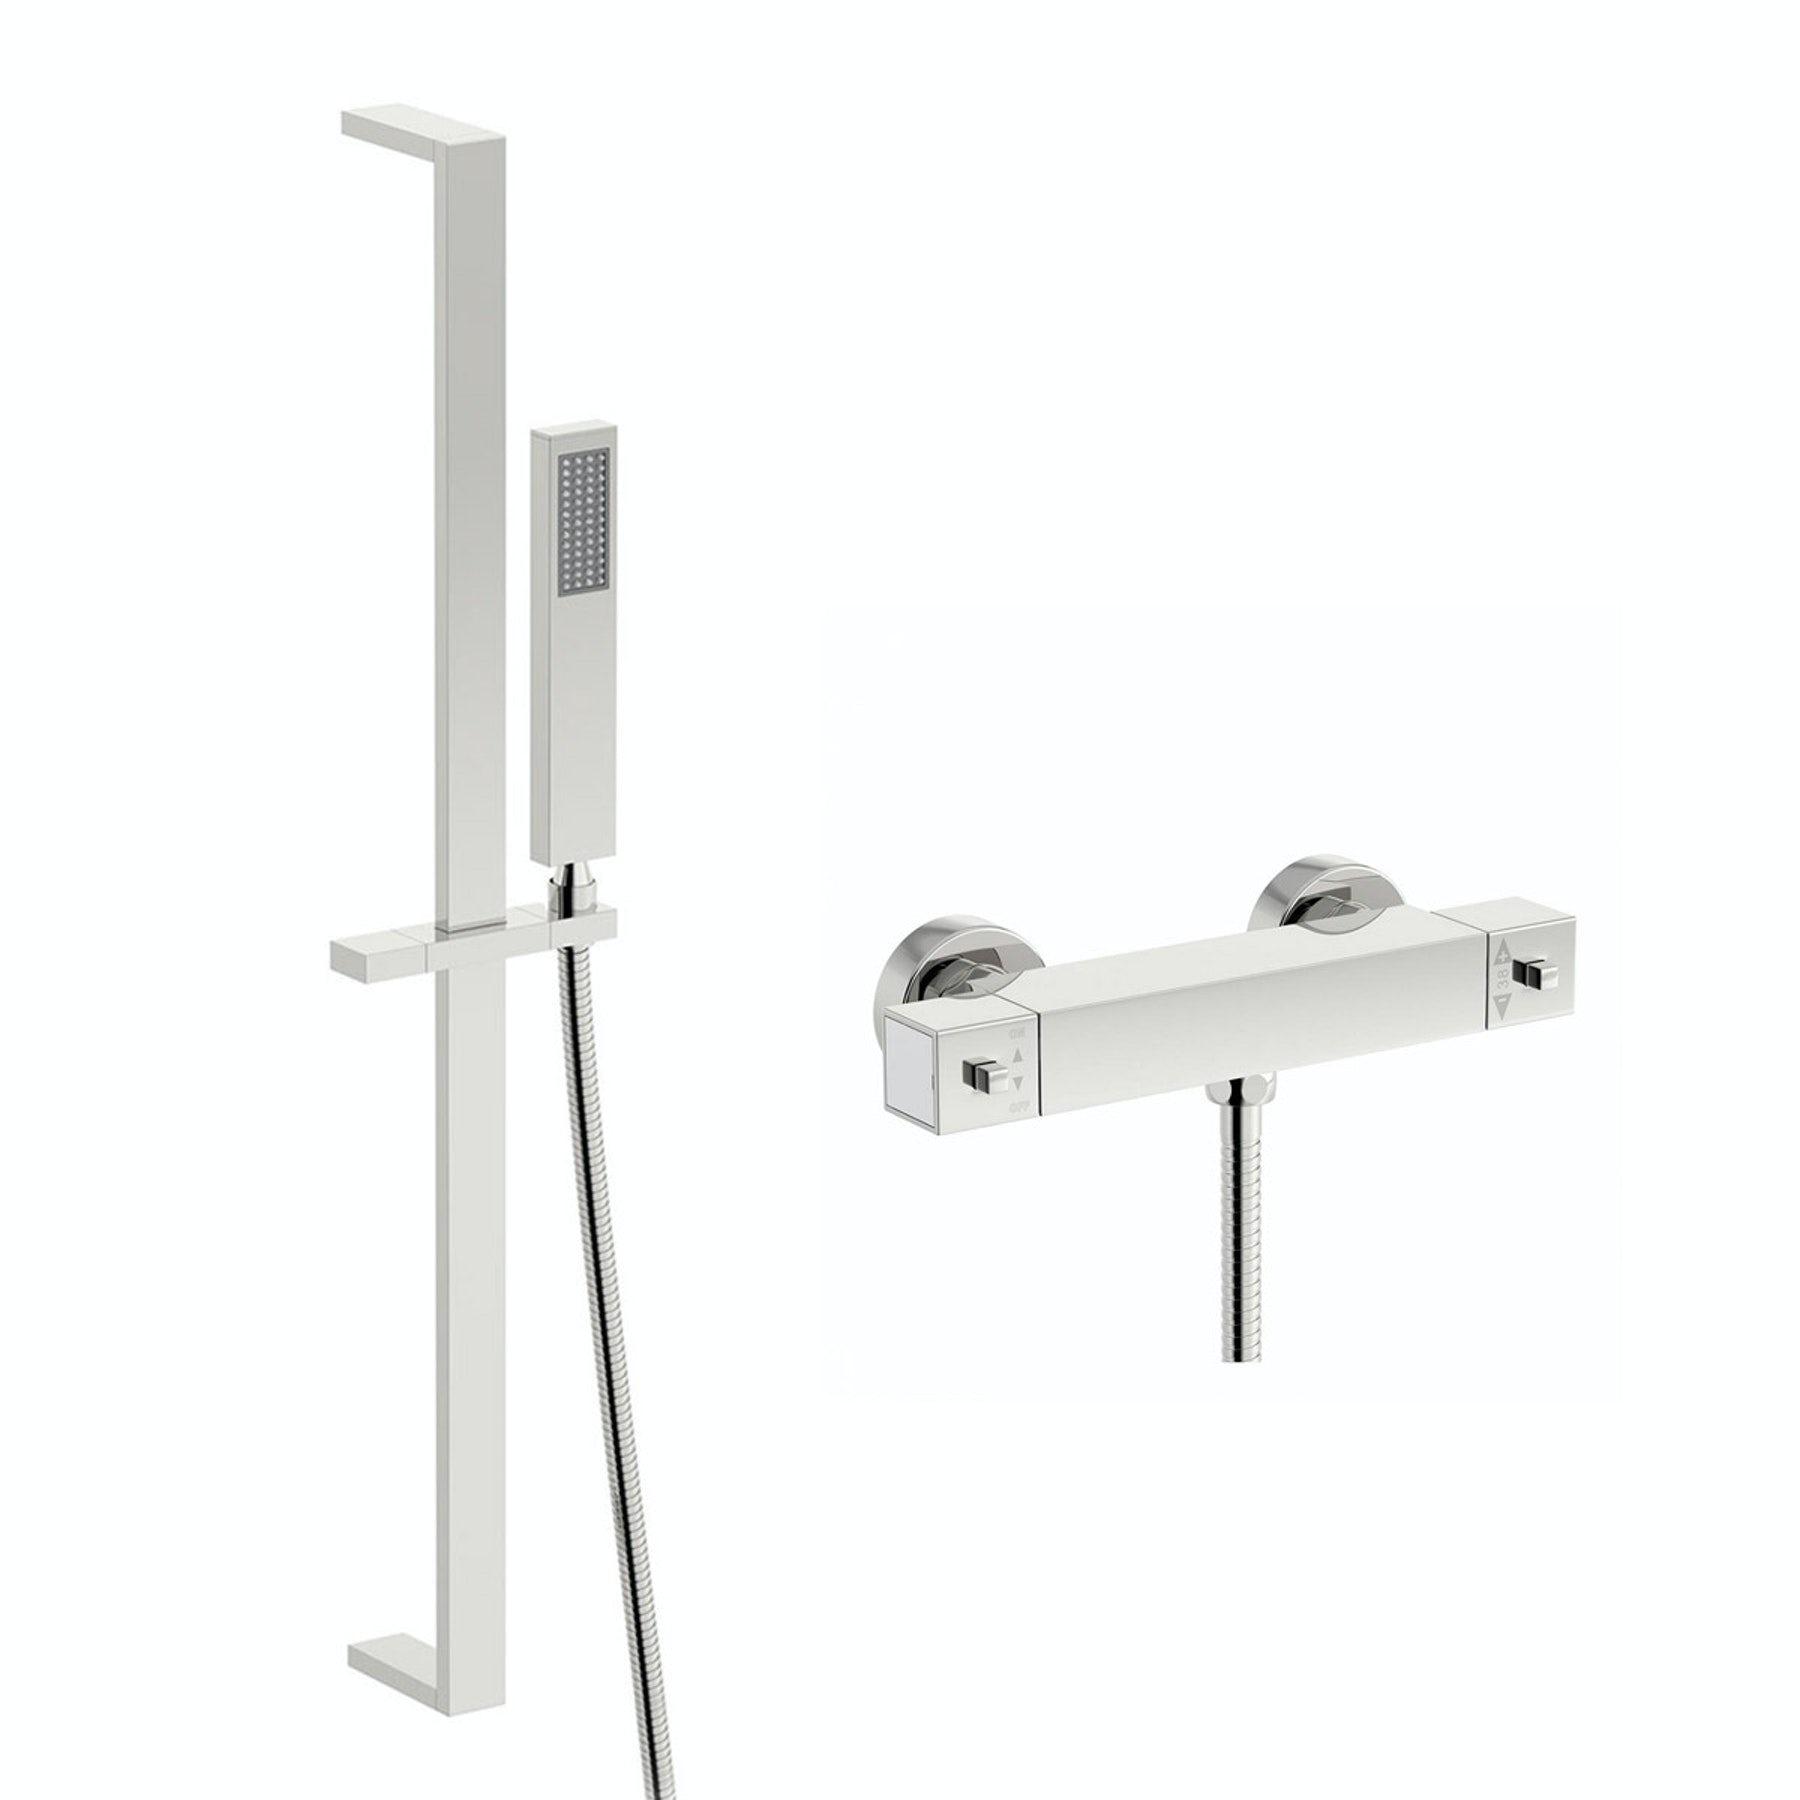 Orchard Wye thermostatic bar shower valve with slider rail kit